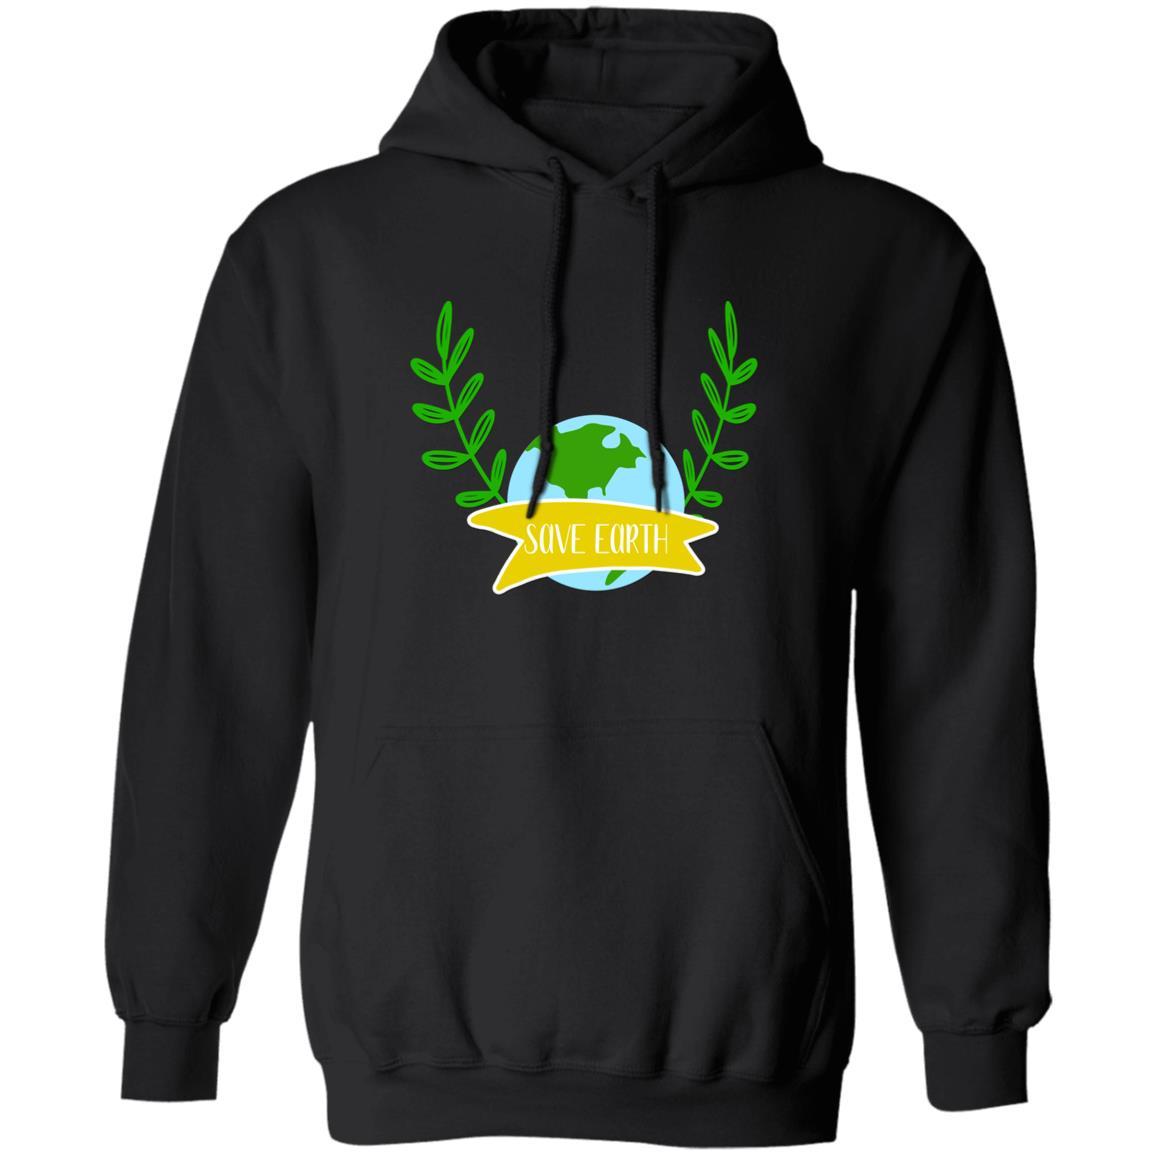 Save Earth Unisex Hoodie